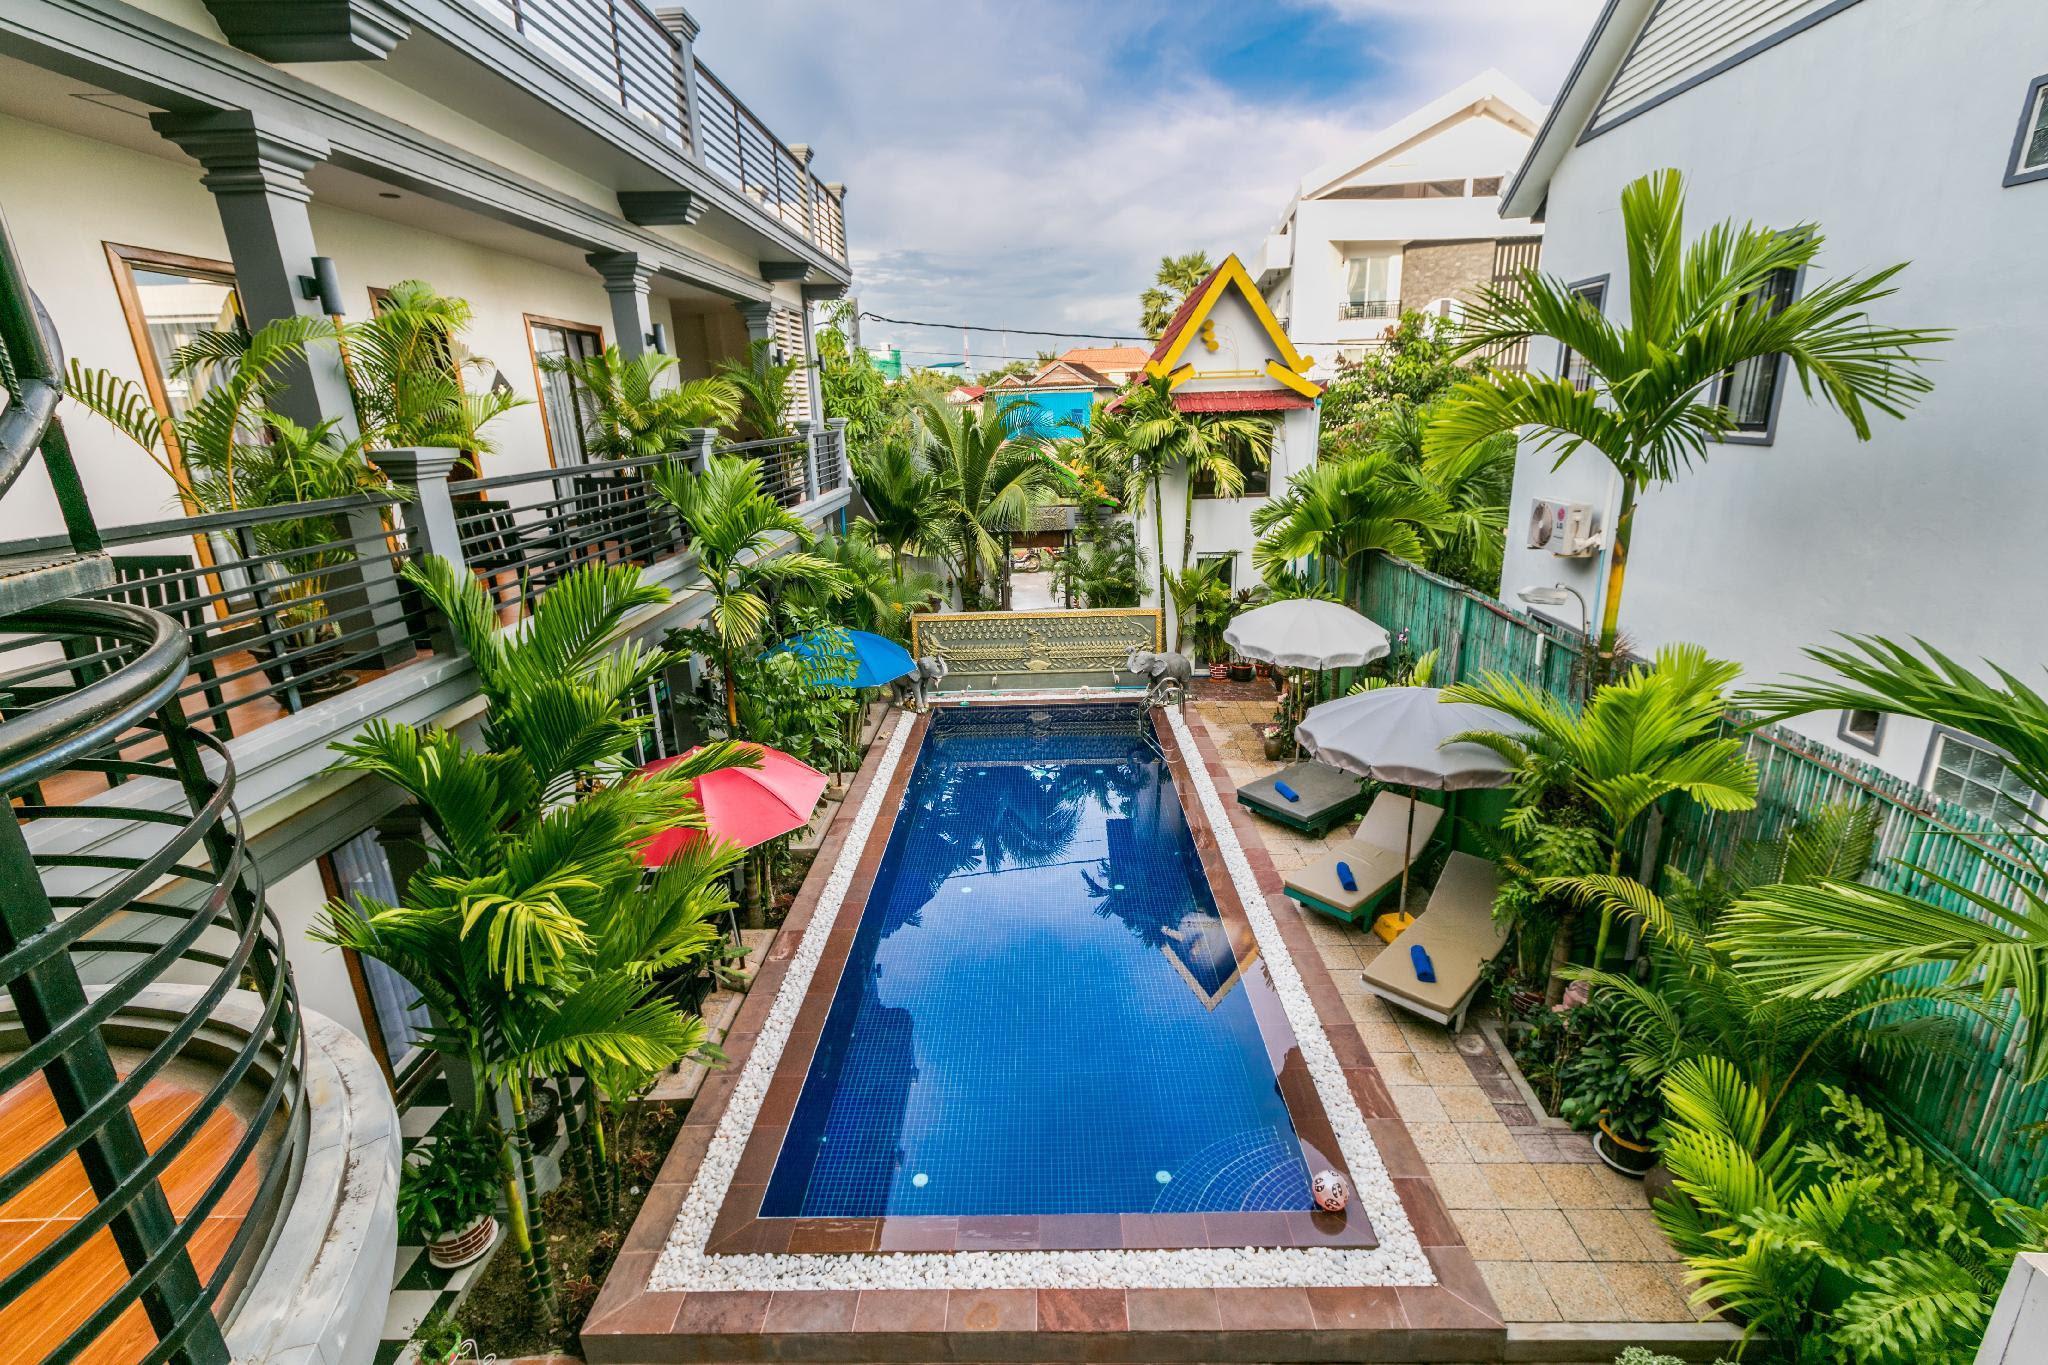 Asanak D'Angkor Boutique Hotel Reviews